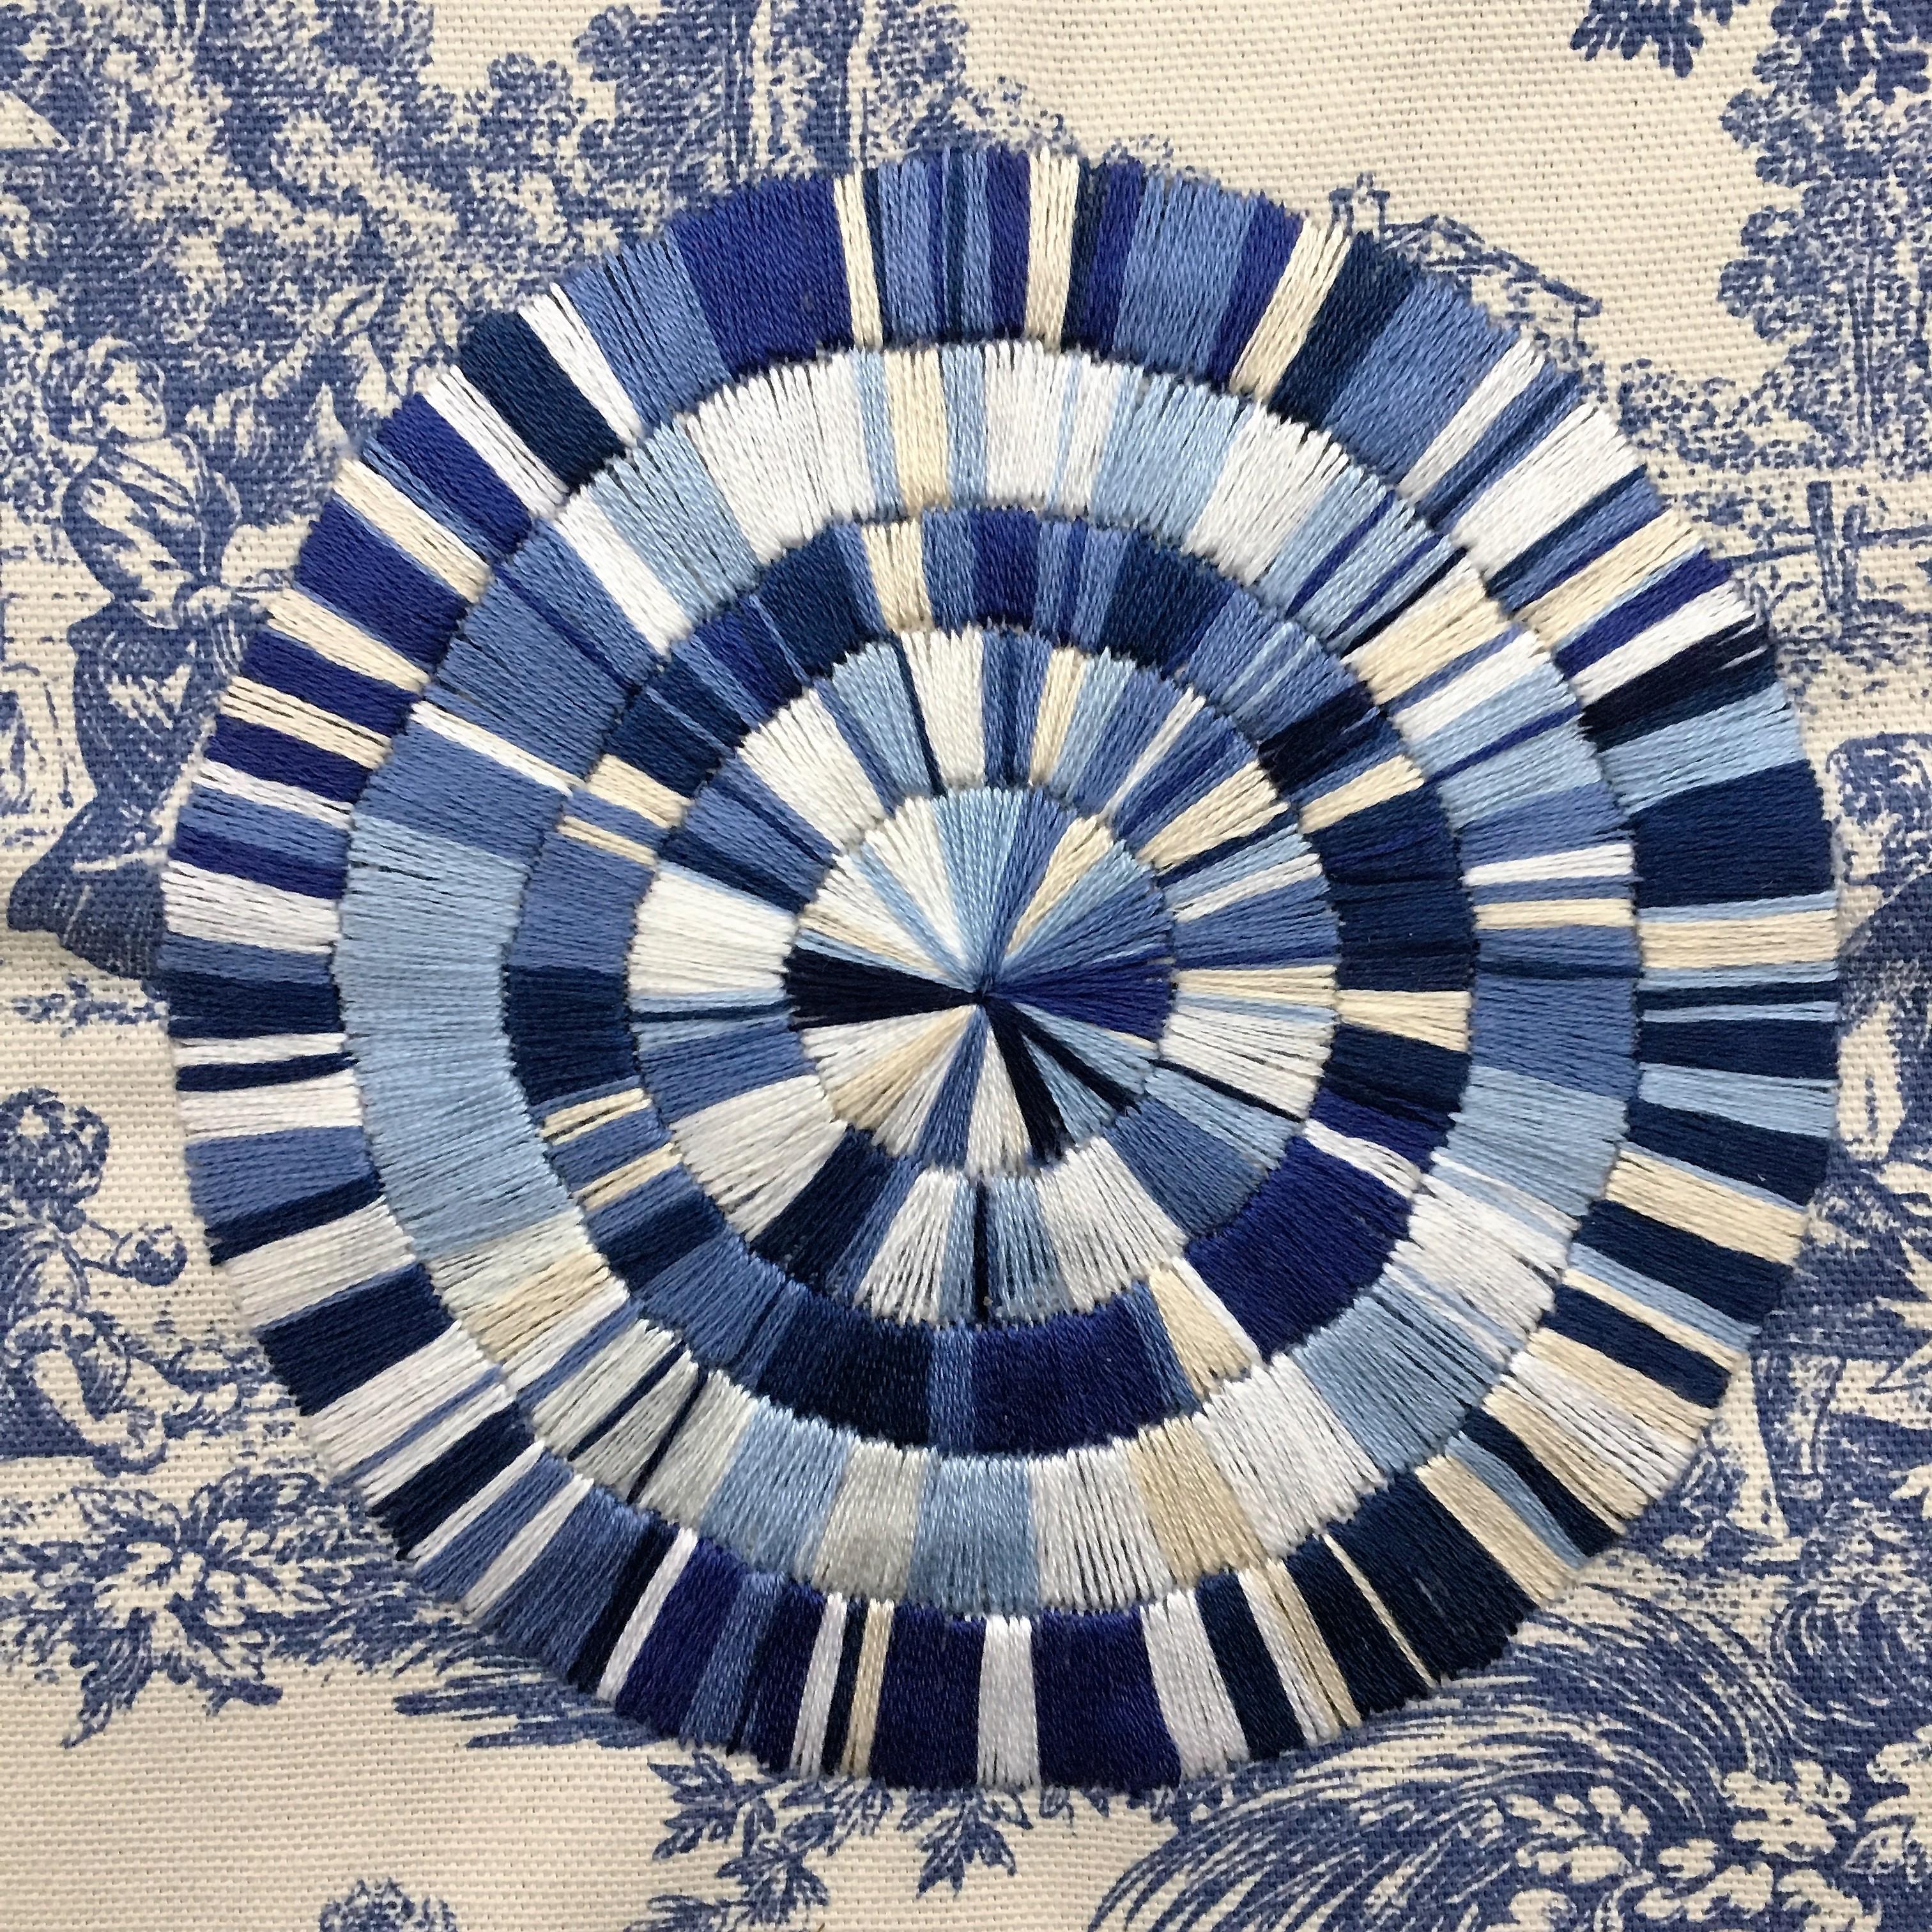 Blue Willow, Journal Series